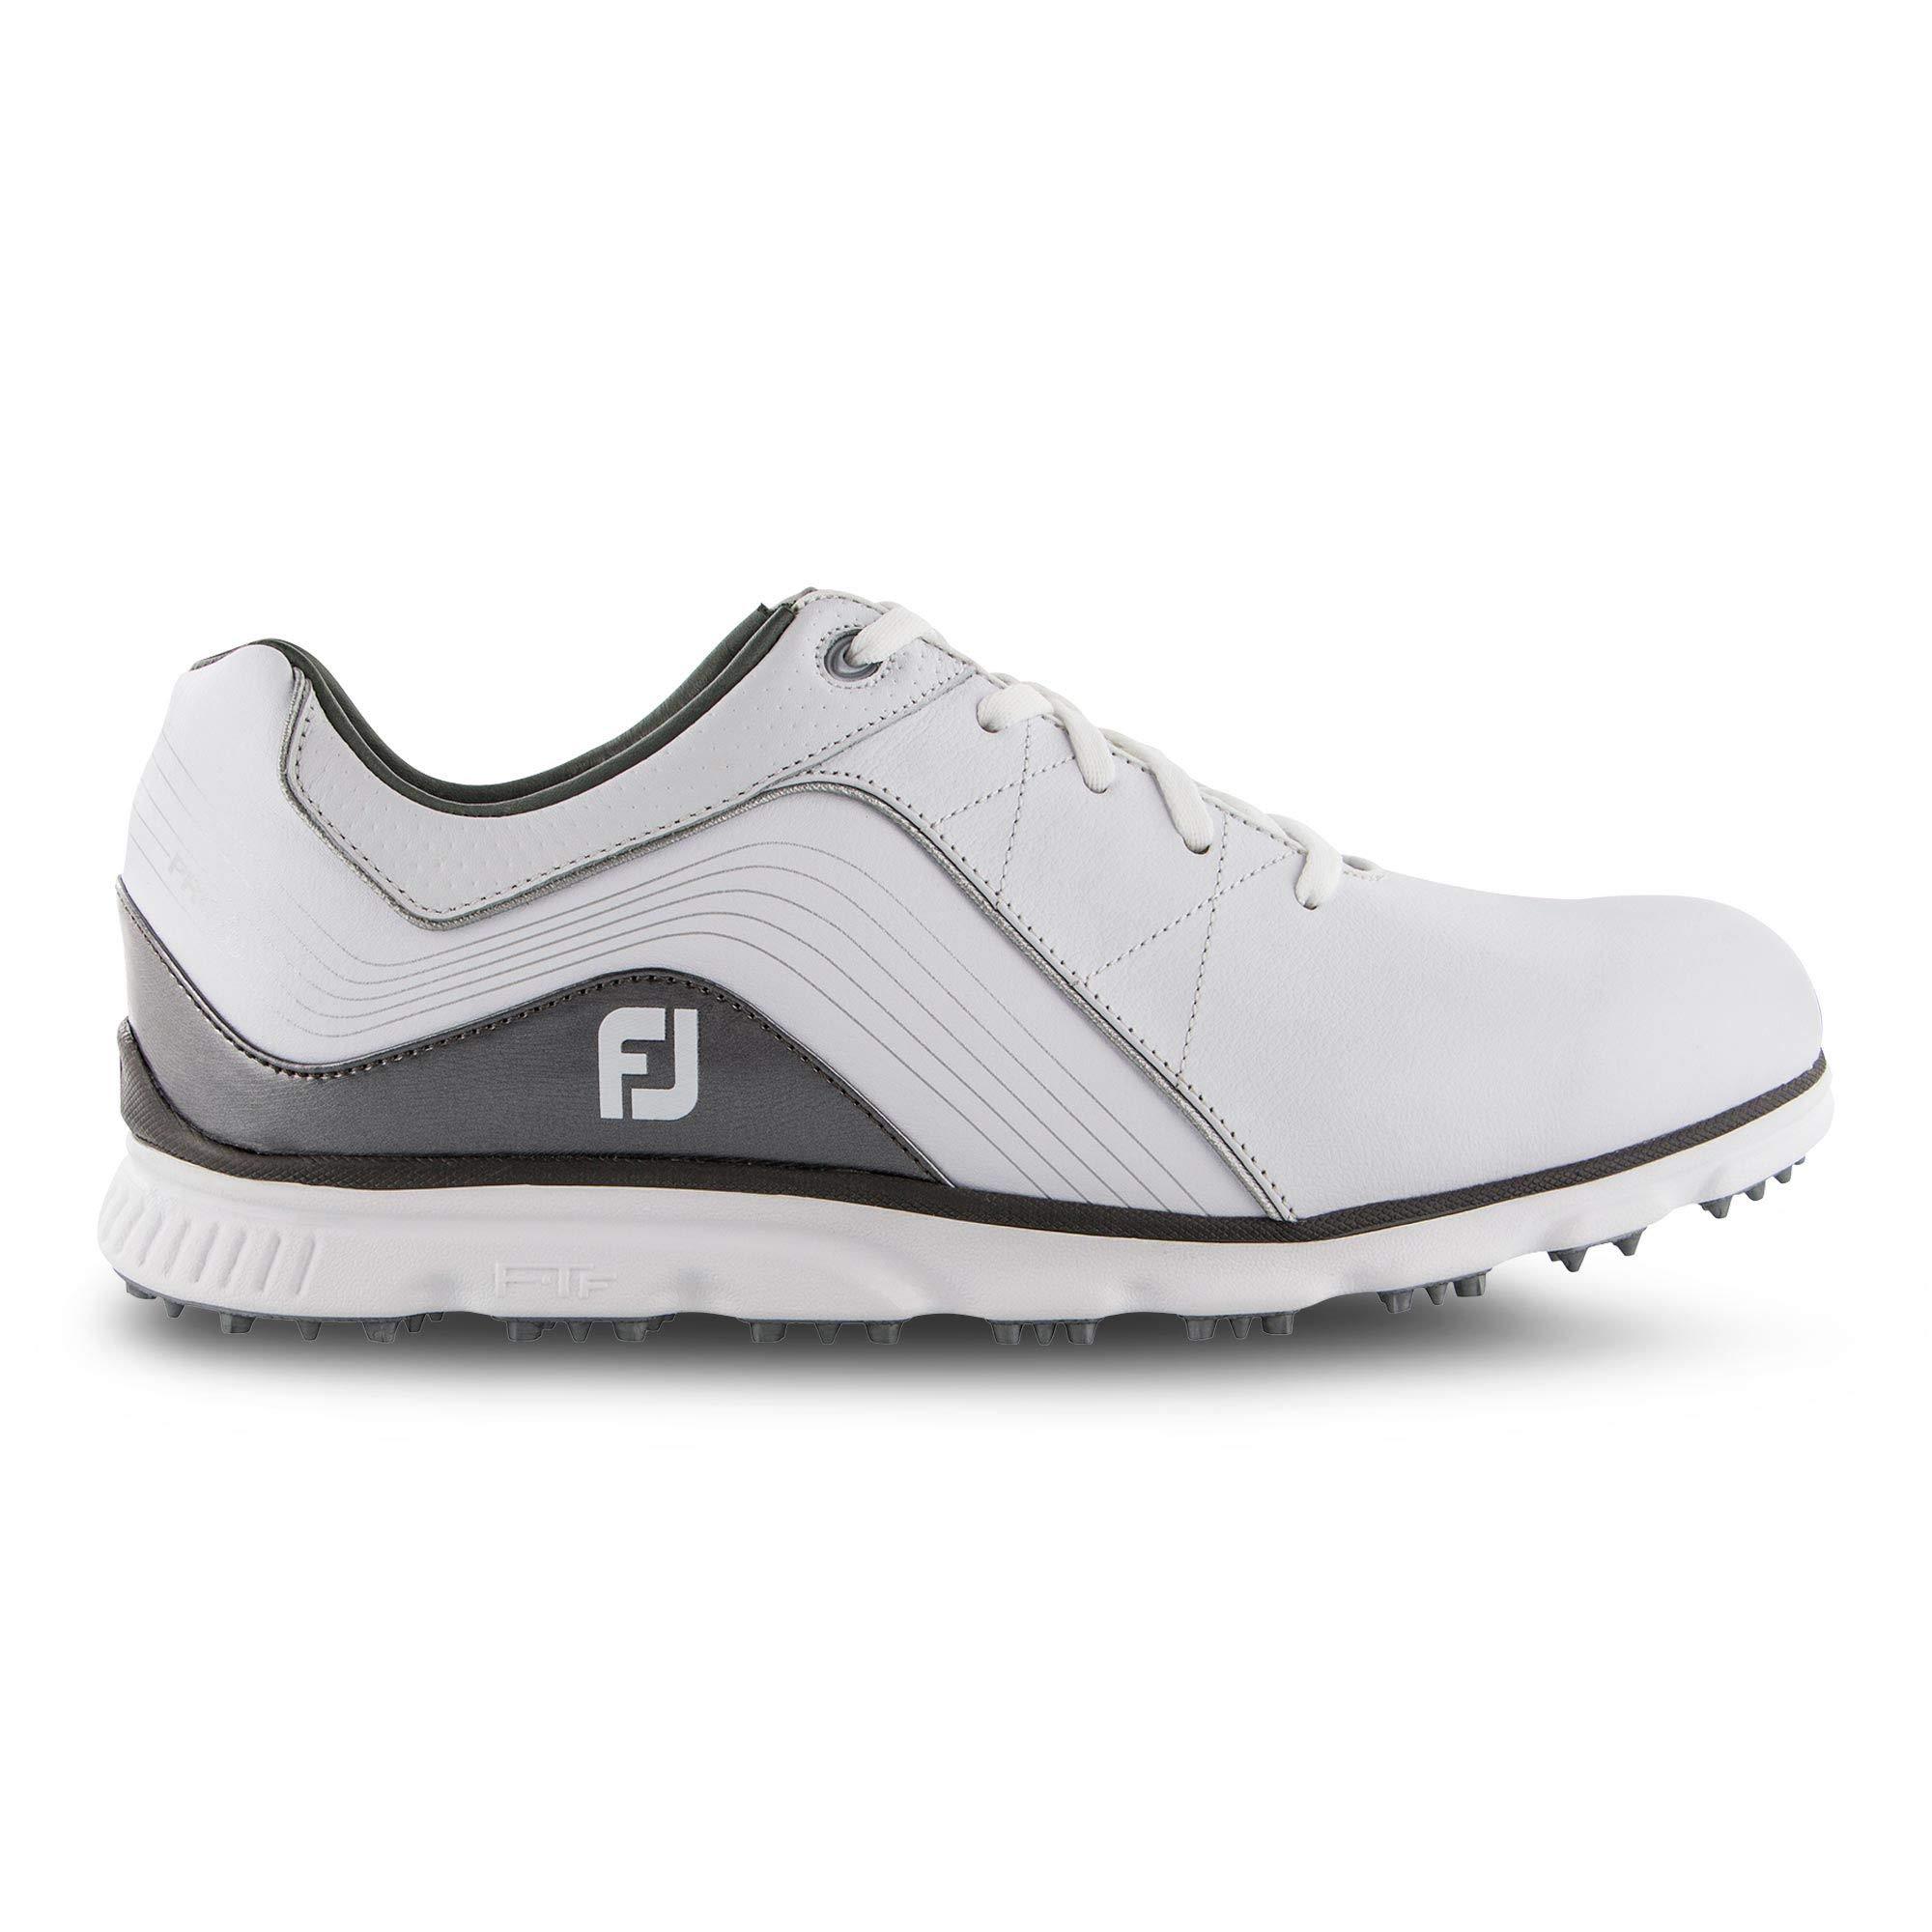 FootJoy Men's Pro/SL Golf Shoes White 13 N Grey, US by FootJoy